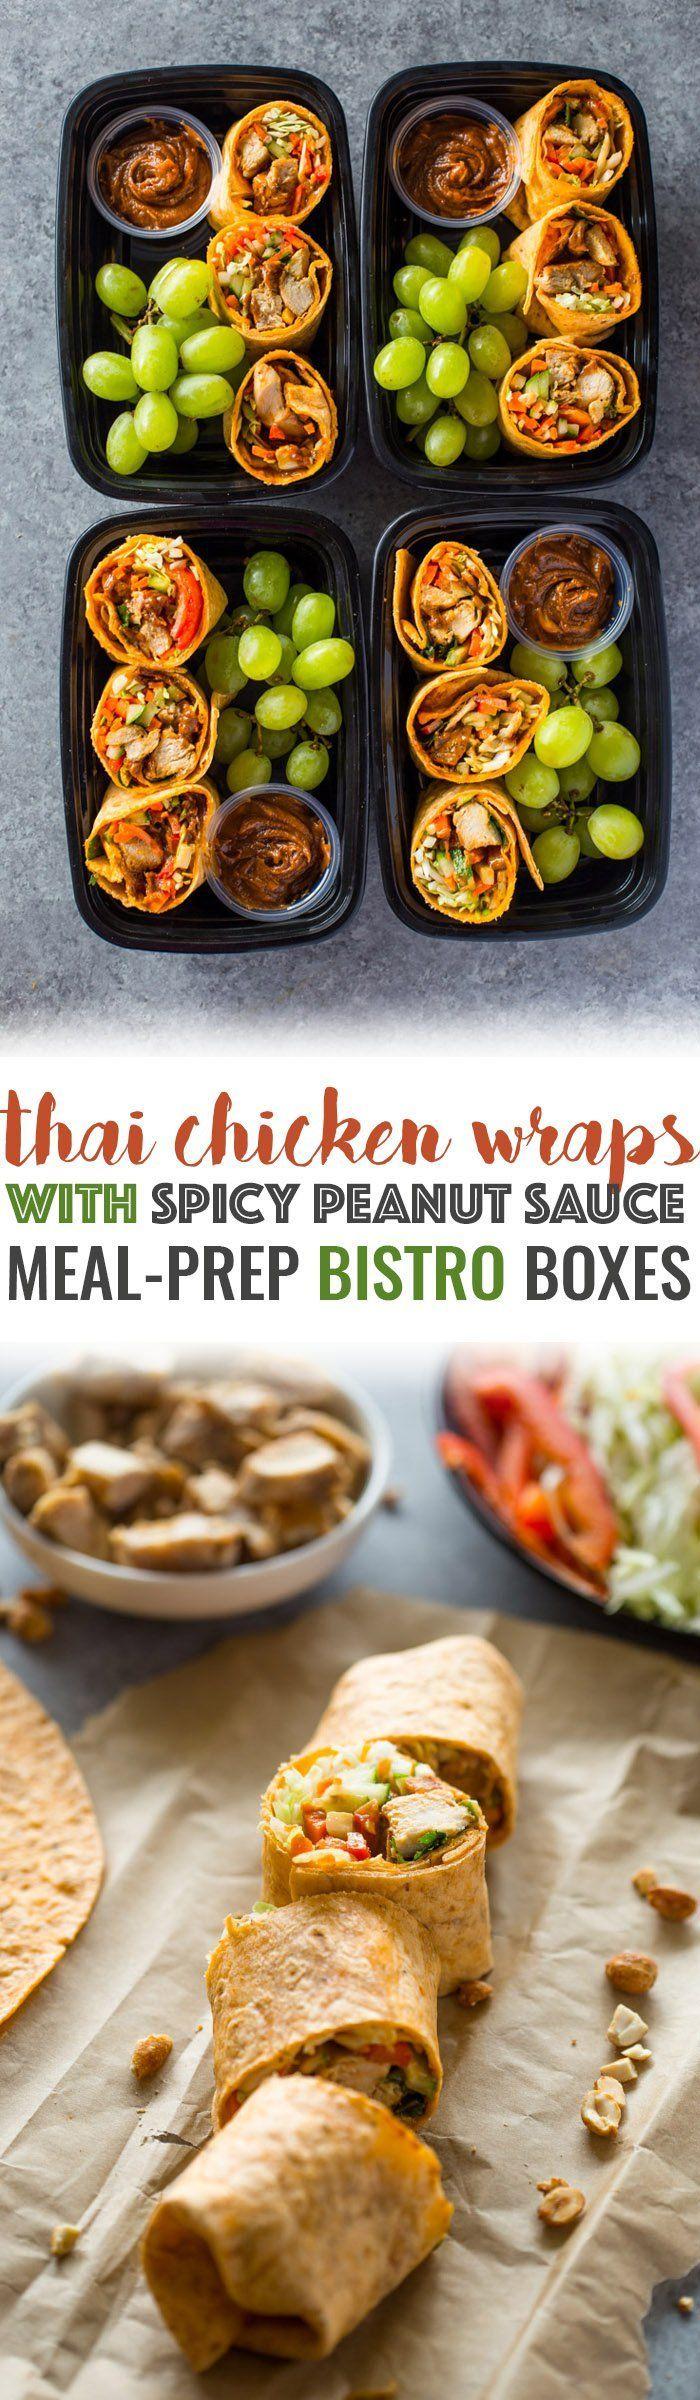 Thai Chicken Wraps Meal-Prep Bistro Boxes